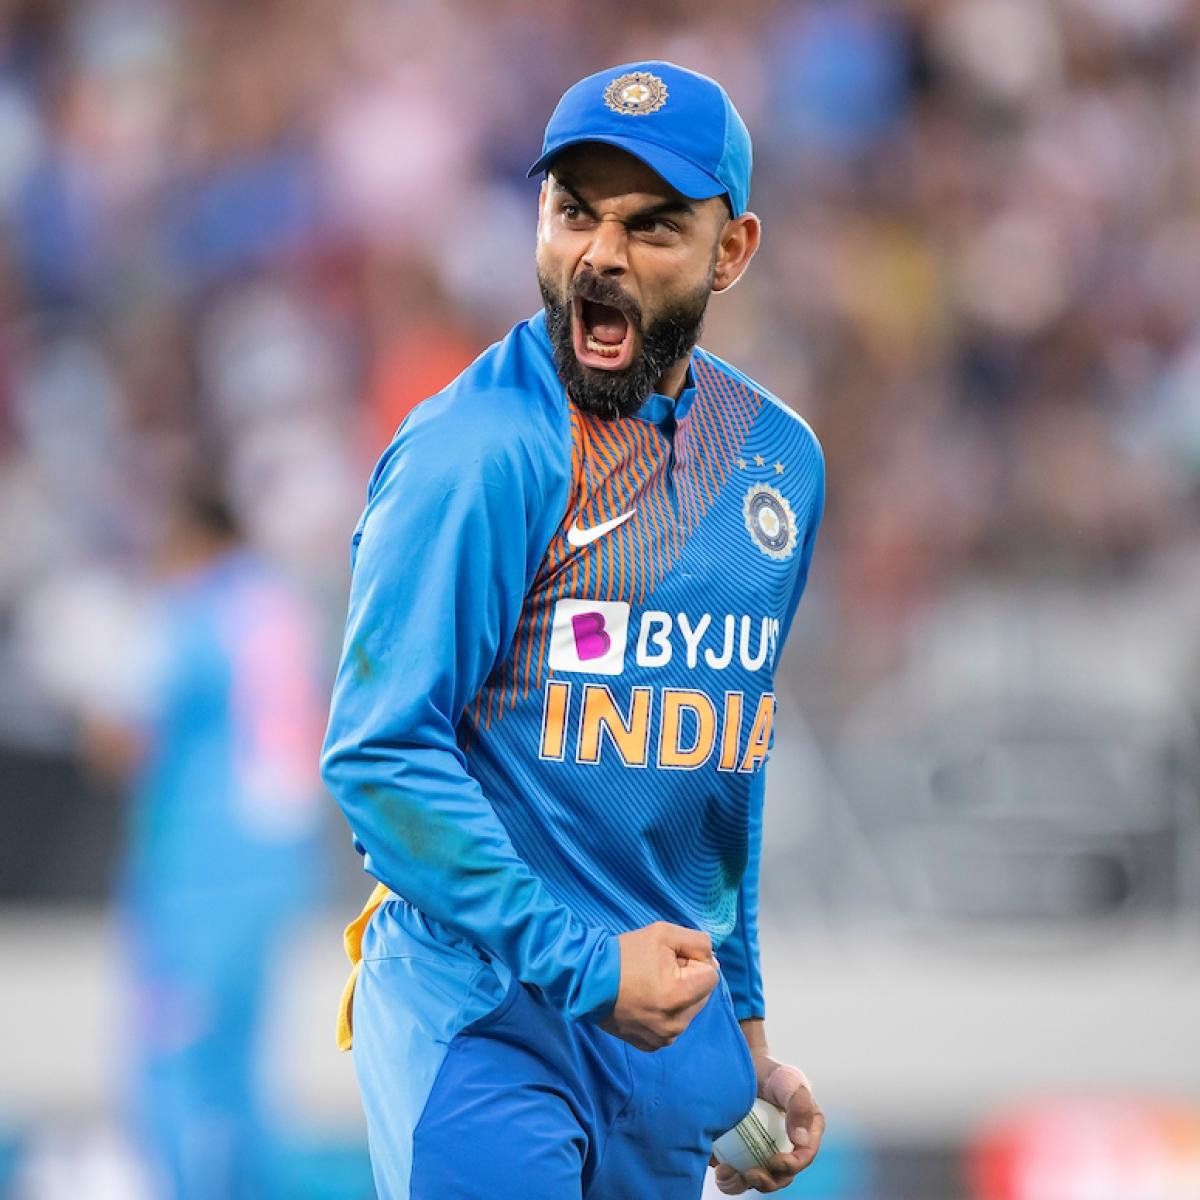 Captain Virat Kohli surpasses MS Dhoni to become India's highest run-scorer in T20Is